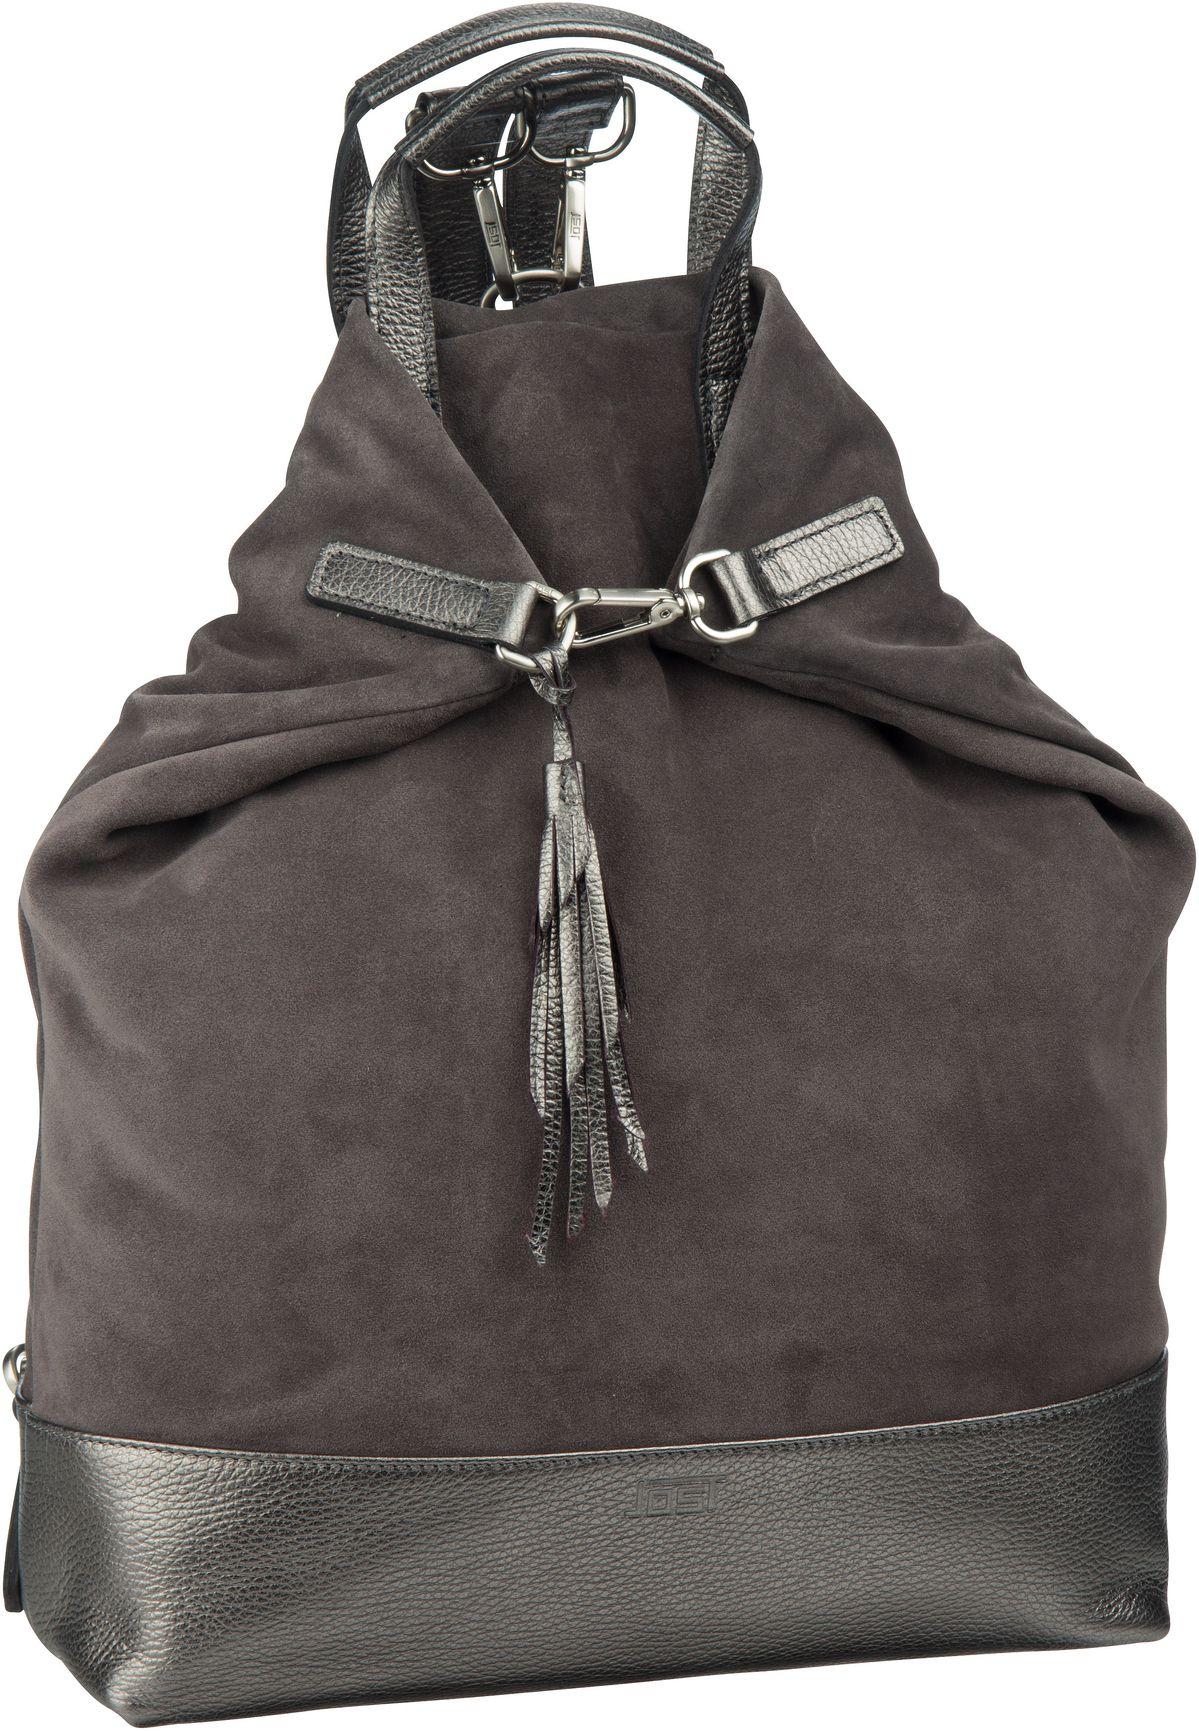 Rucksack / Daypack Motala 1748 X-Change Bag 3in1 M Silver